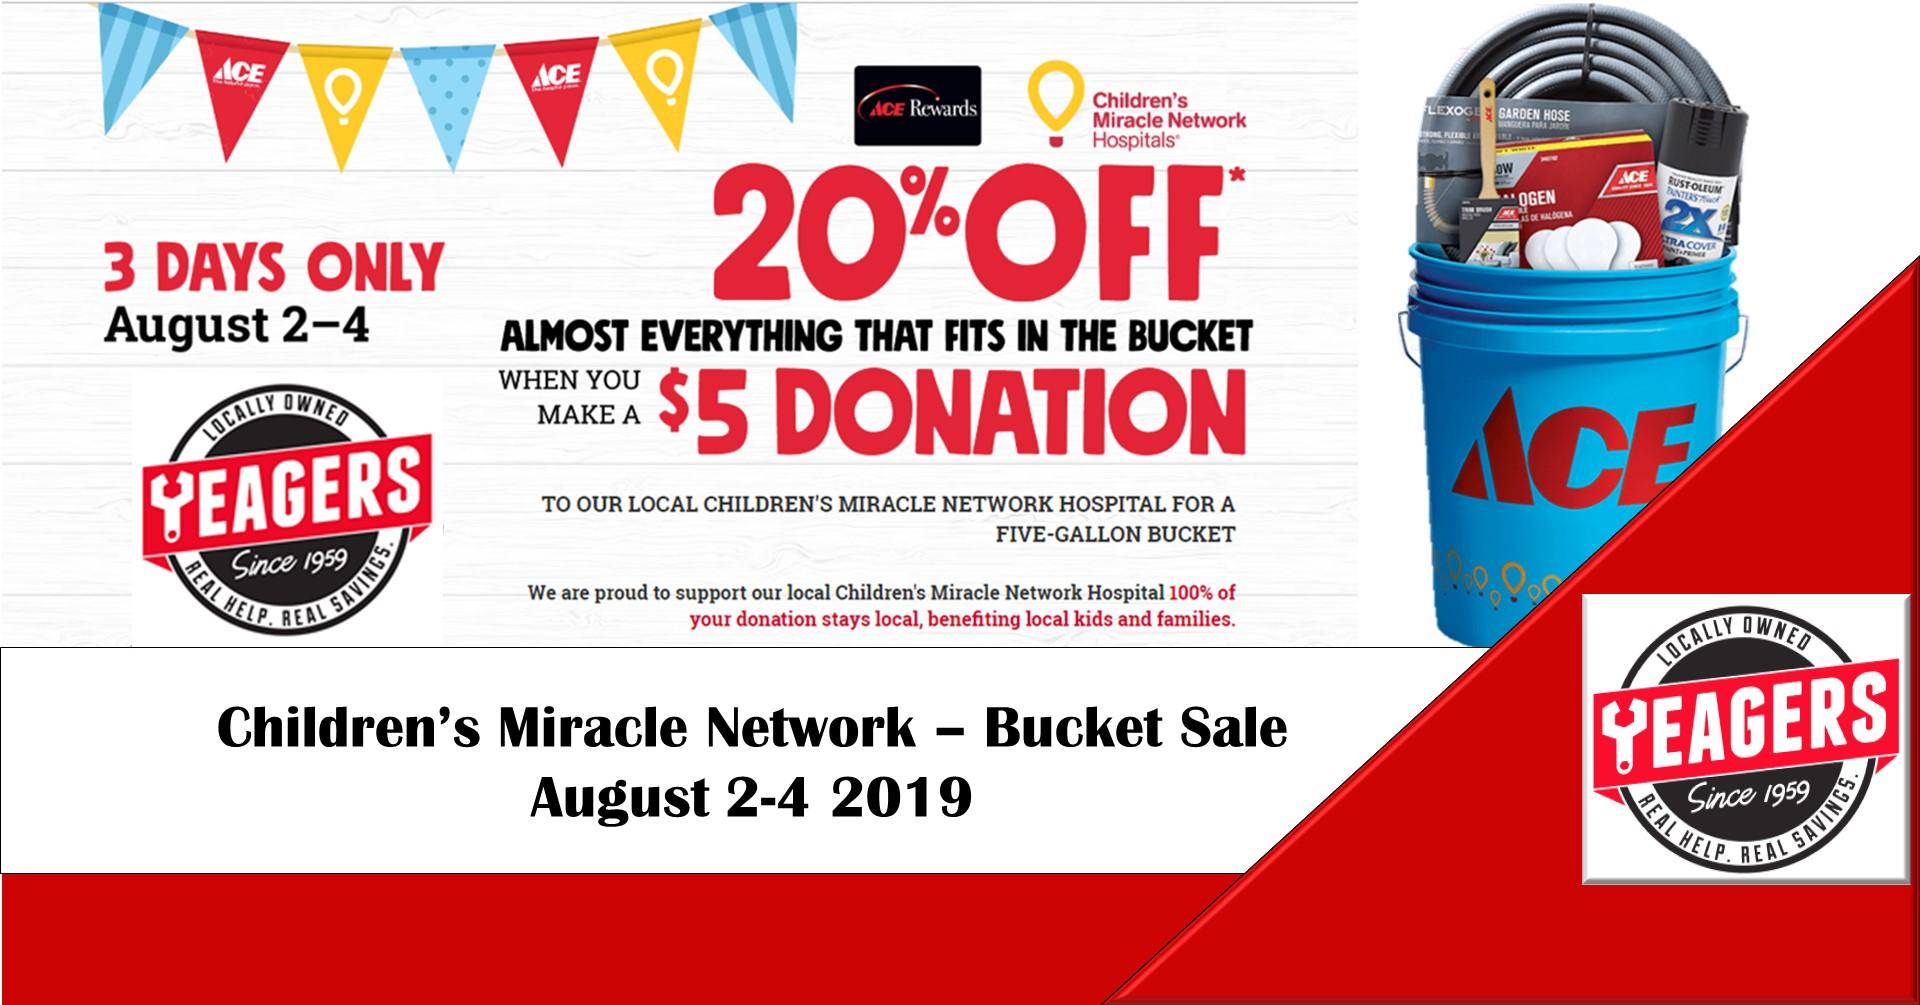 CMN Bucket Sale – August 2-4